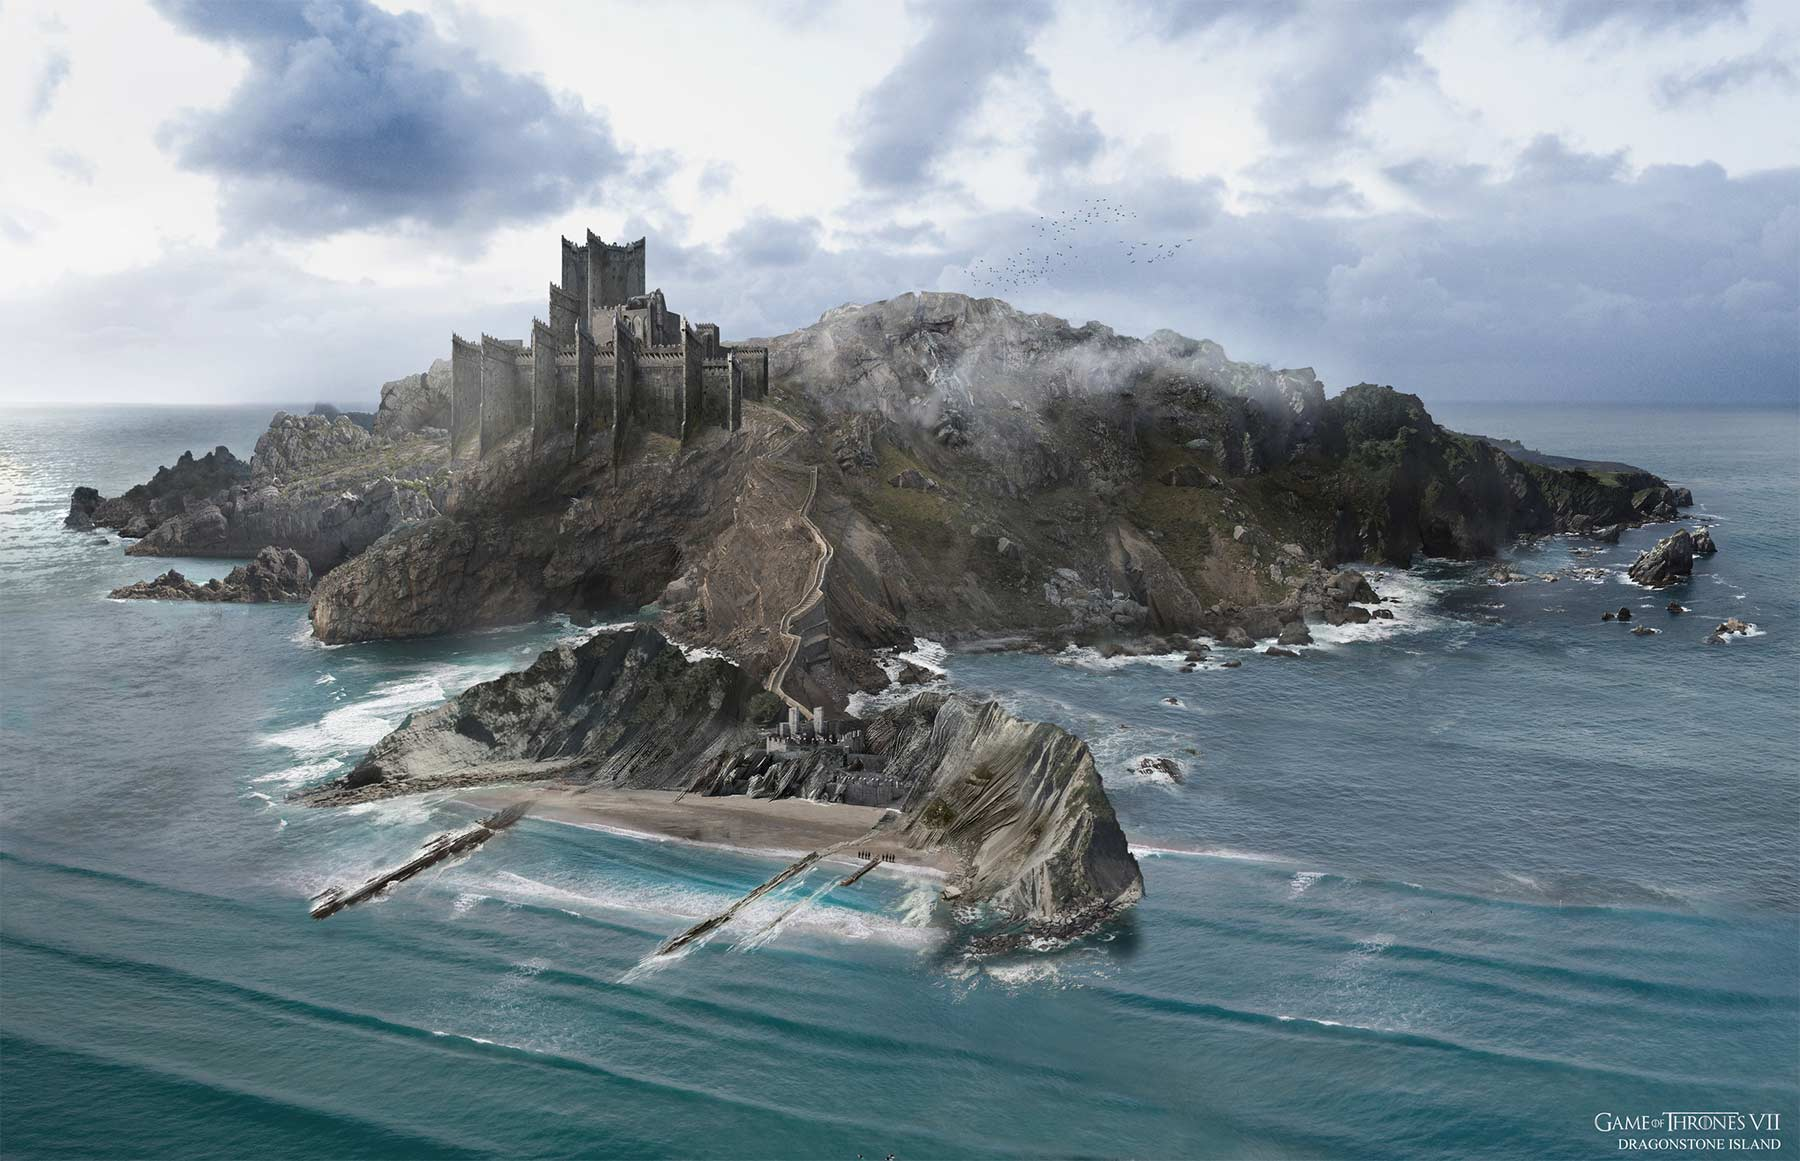 Game of Thrones Staffel 7 Concept Art Kieran-Belshaw-game-of-thrones-concept-art_05